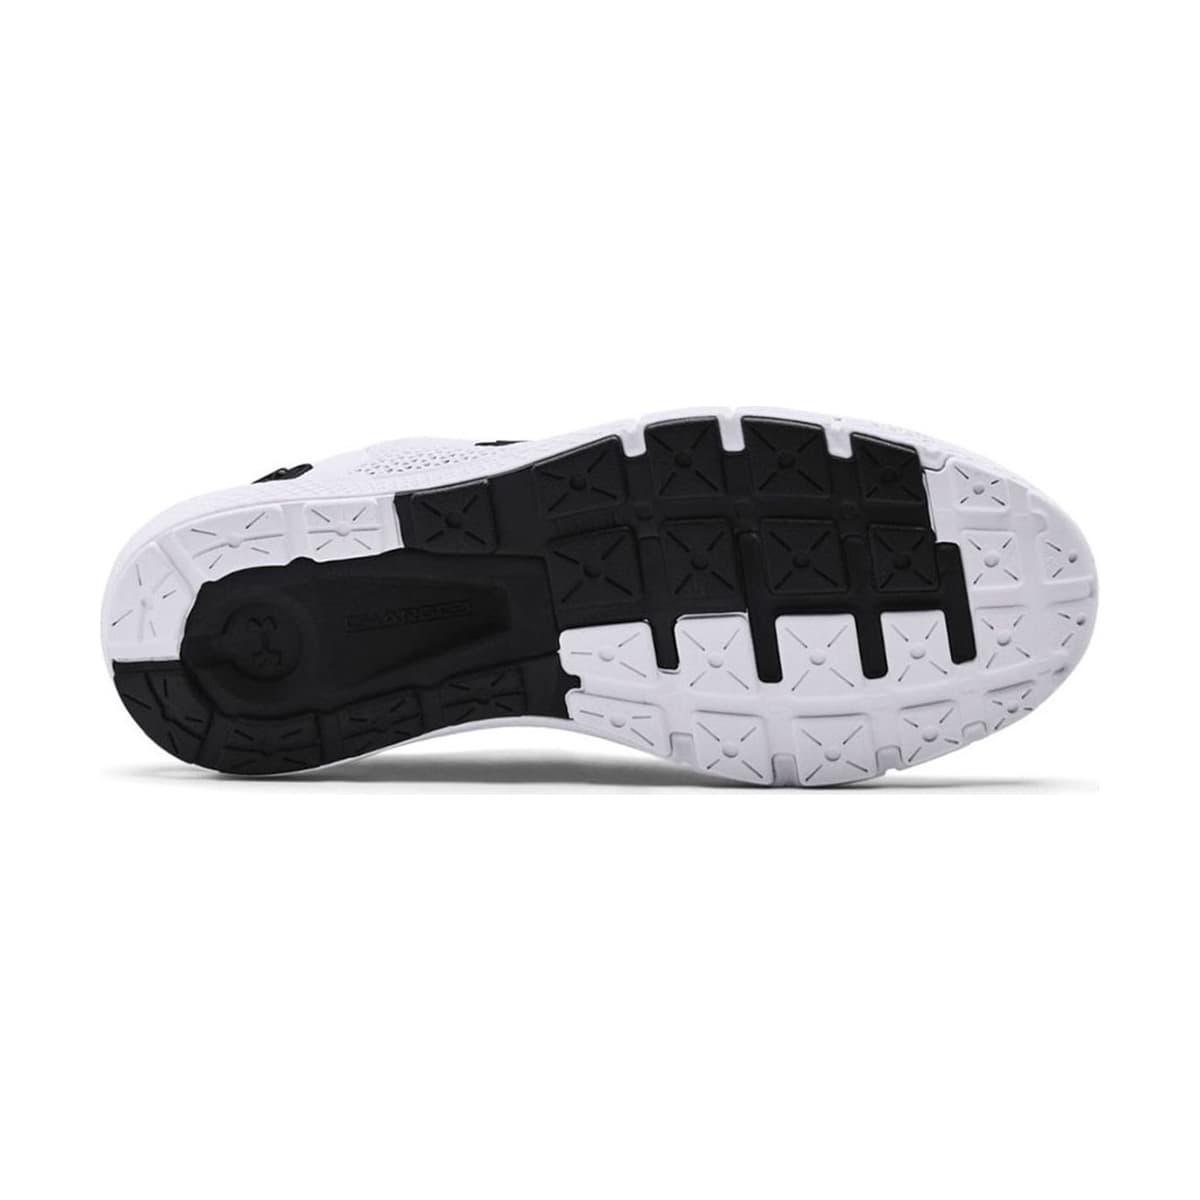 Charged Rogue 2.5 Erkek Beyaz Koşu Ayakkabısı (3024400-101)